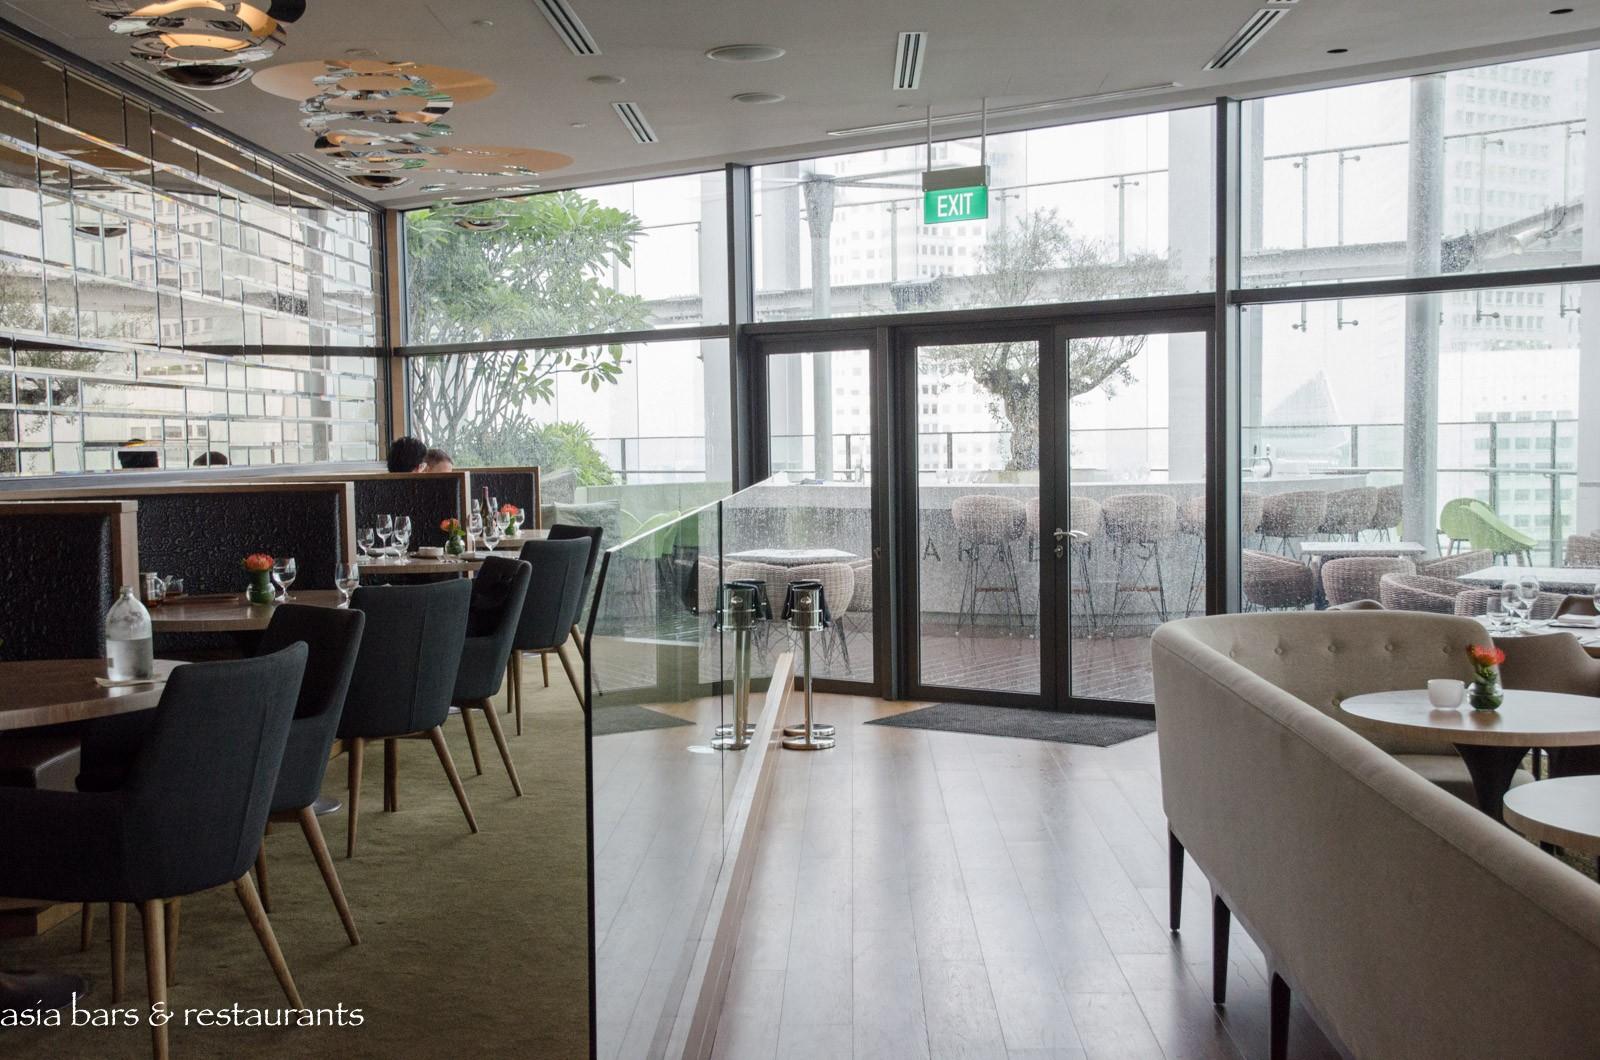 Artemis Grill Rooftop Mediterranean Restaurant Amp Bar